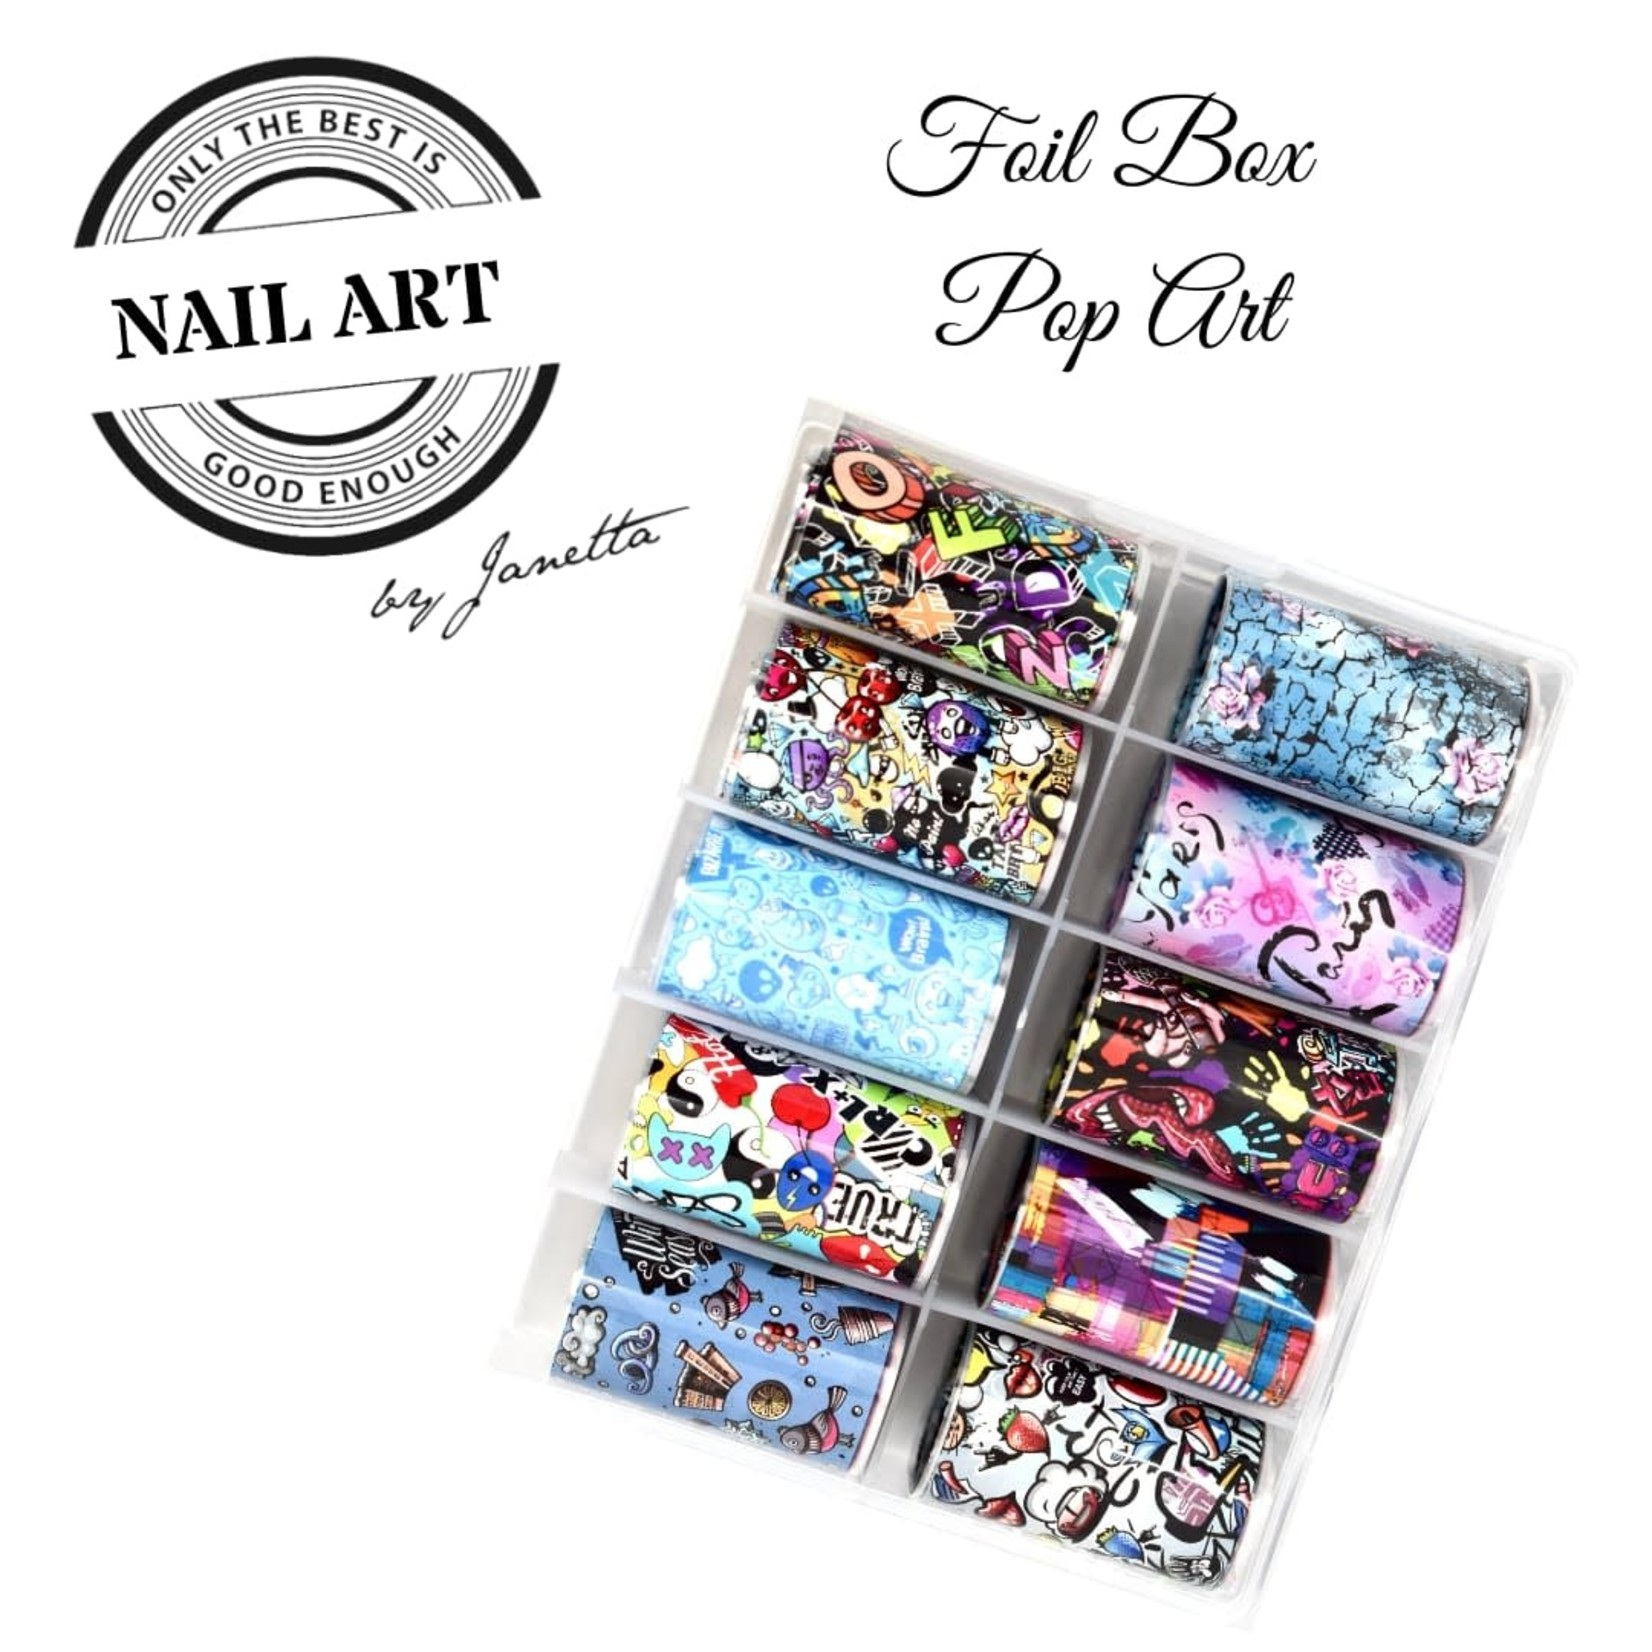 Urban Nails Foil Box Pop Art